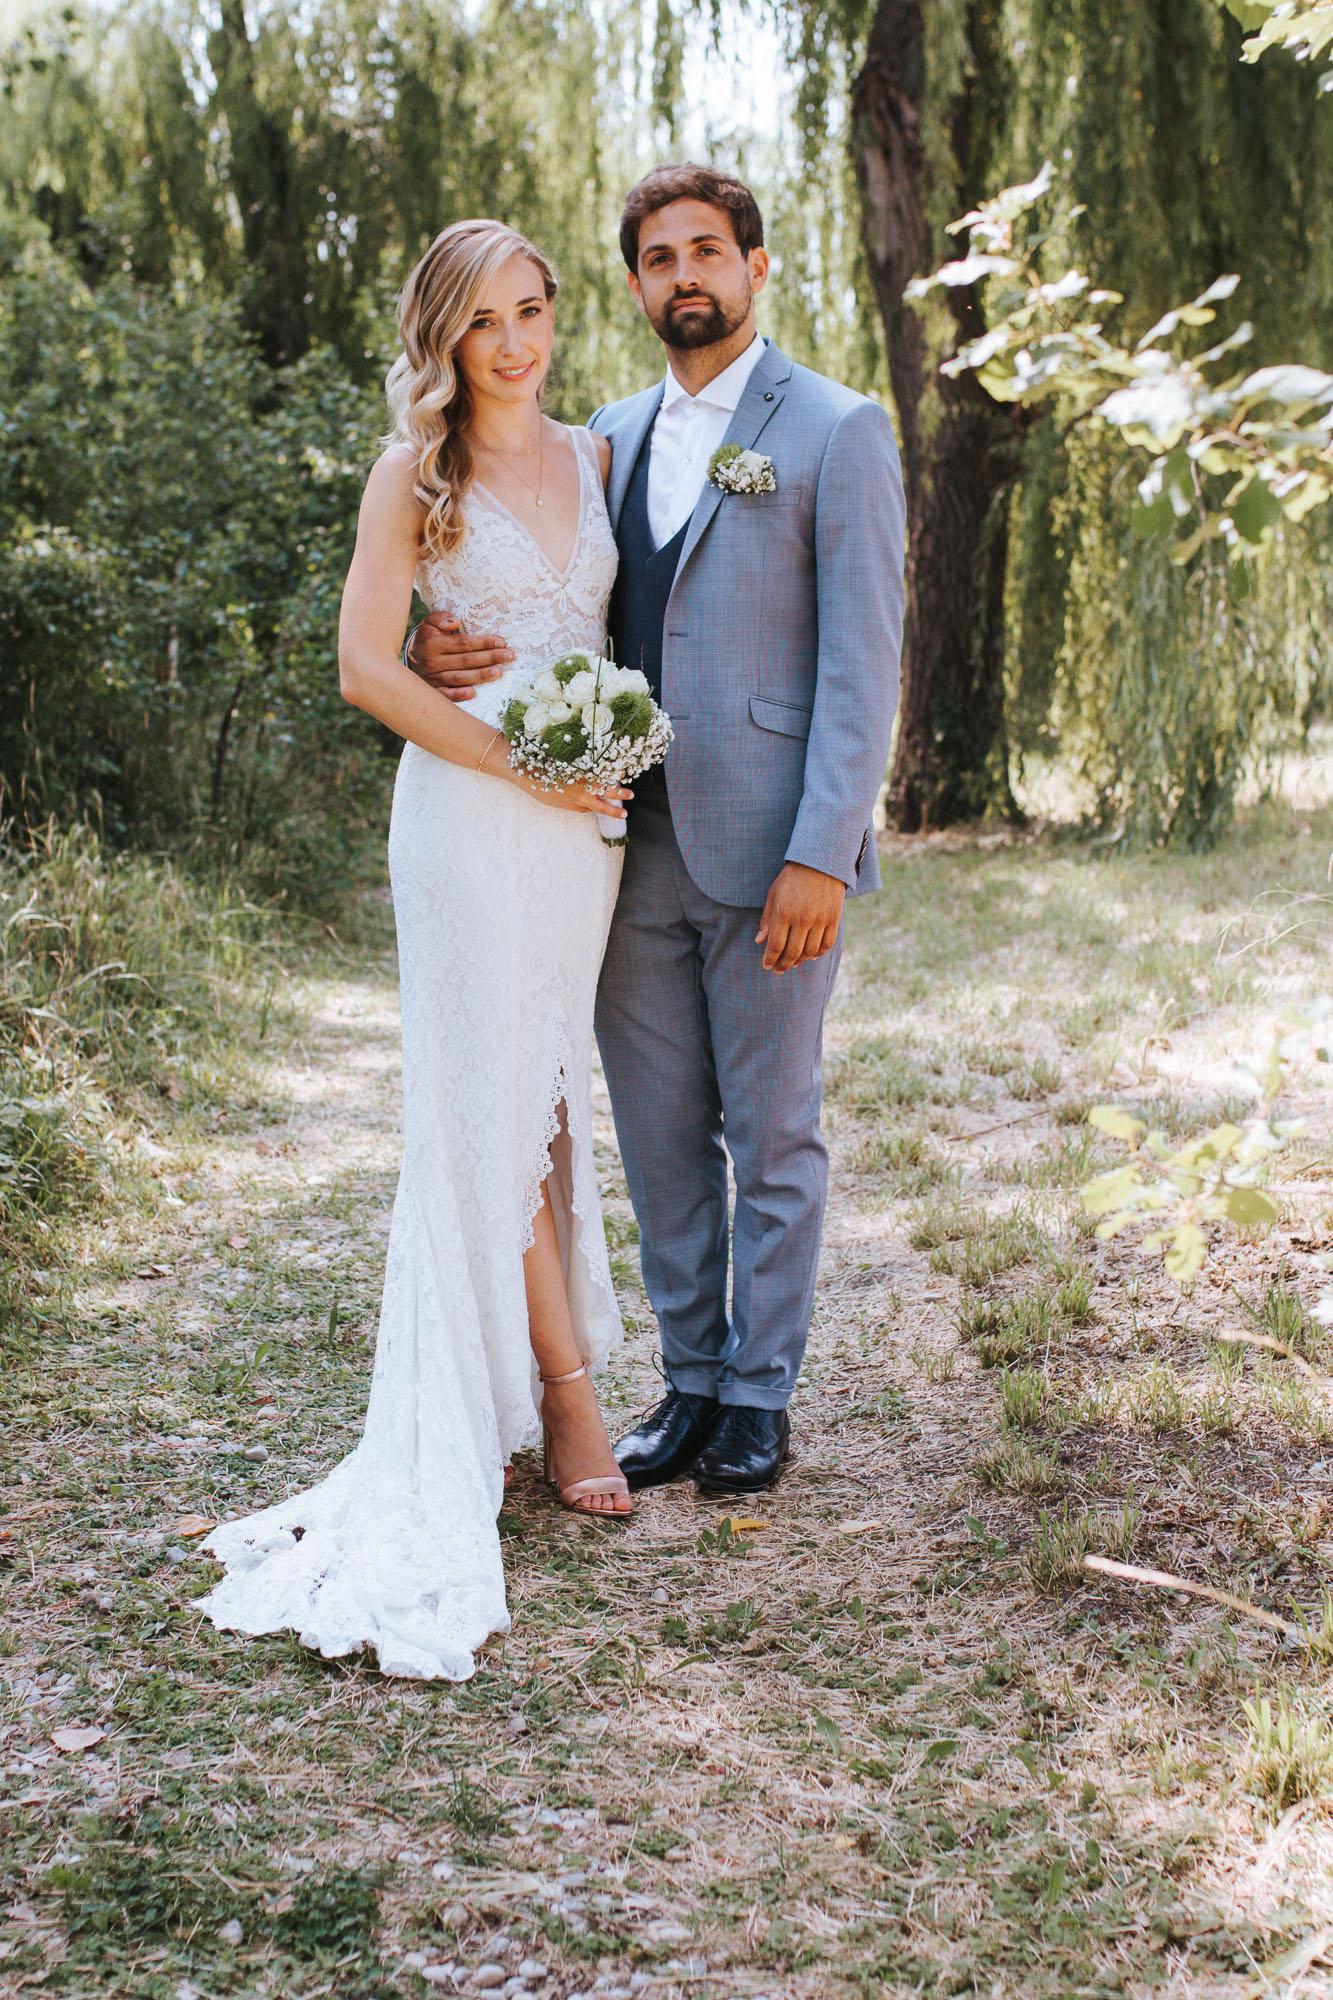 20180720-Memoryfactory-Sara&Jacopo-26- Hochzeit.jpg